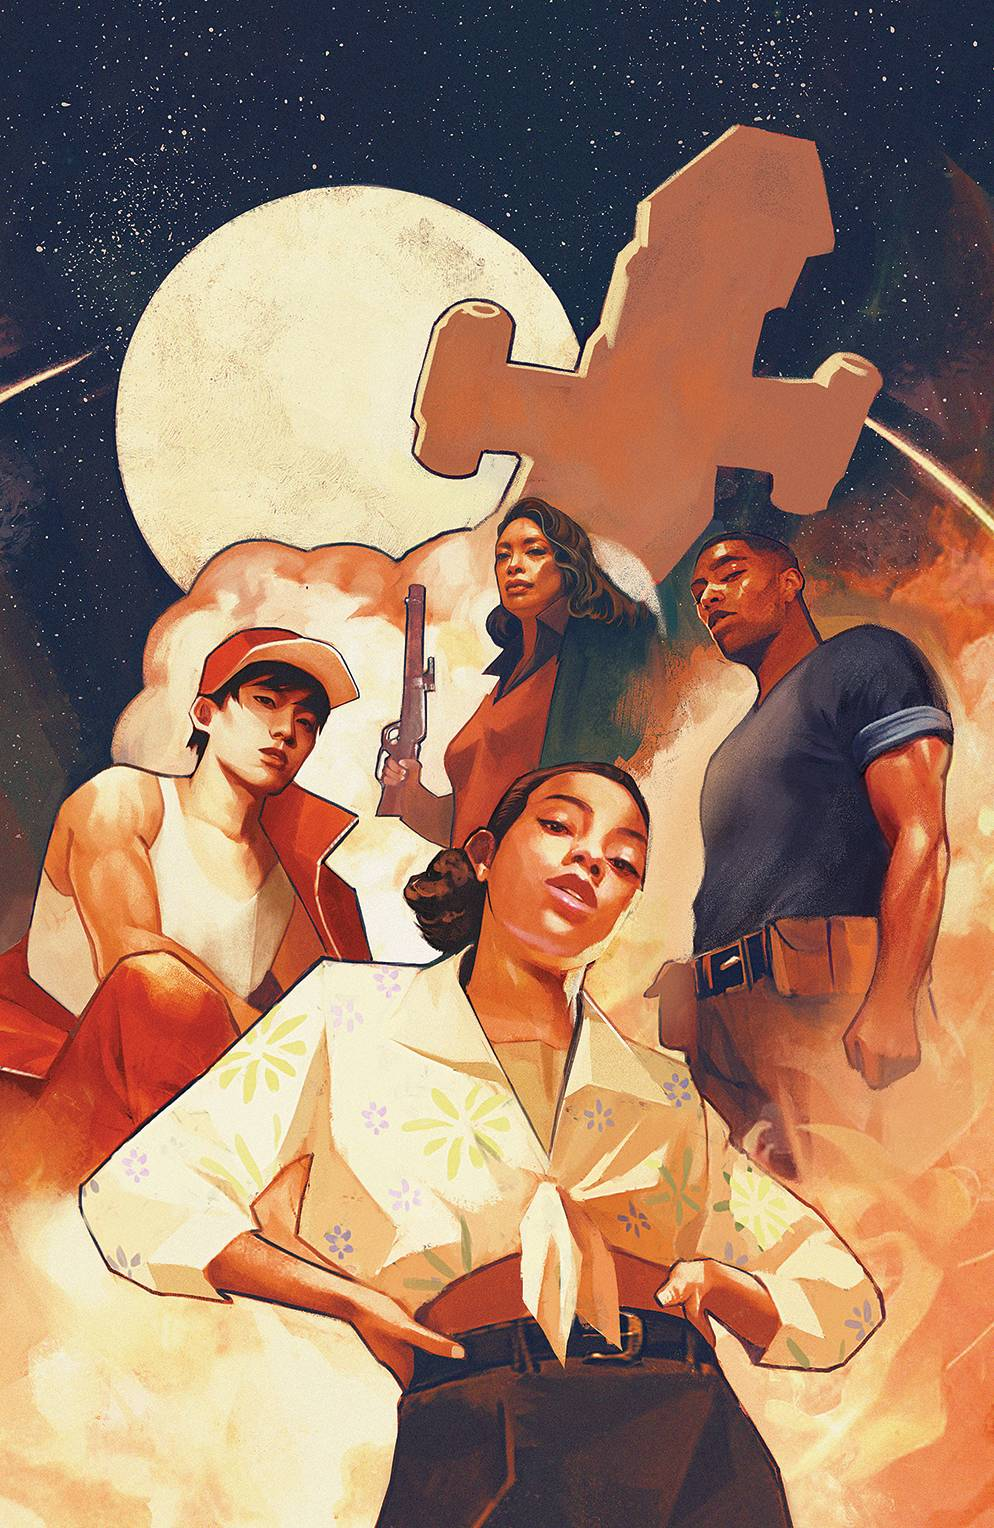 STL186494 ComicList Previews: FIREFLY BRAND NEW 'VERSE #1